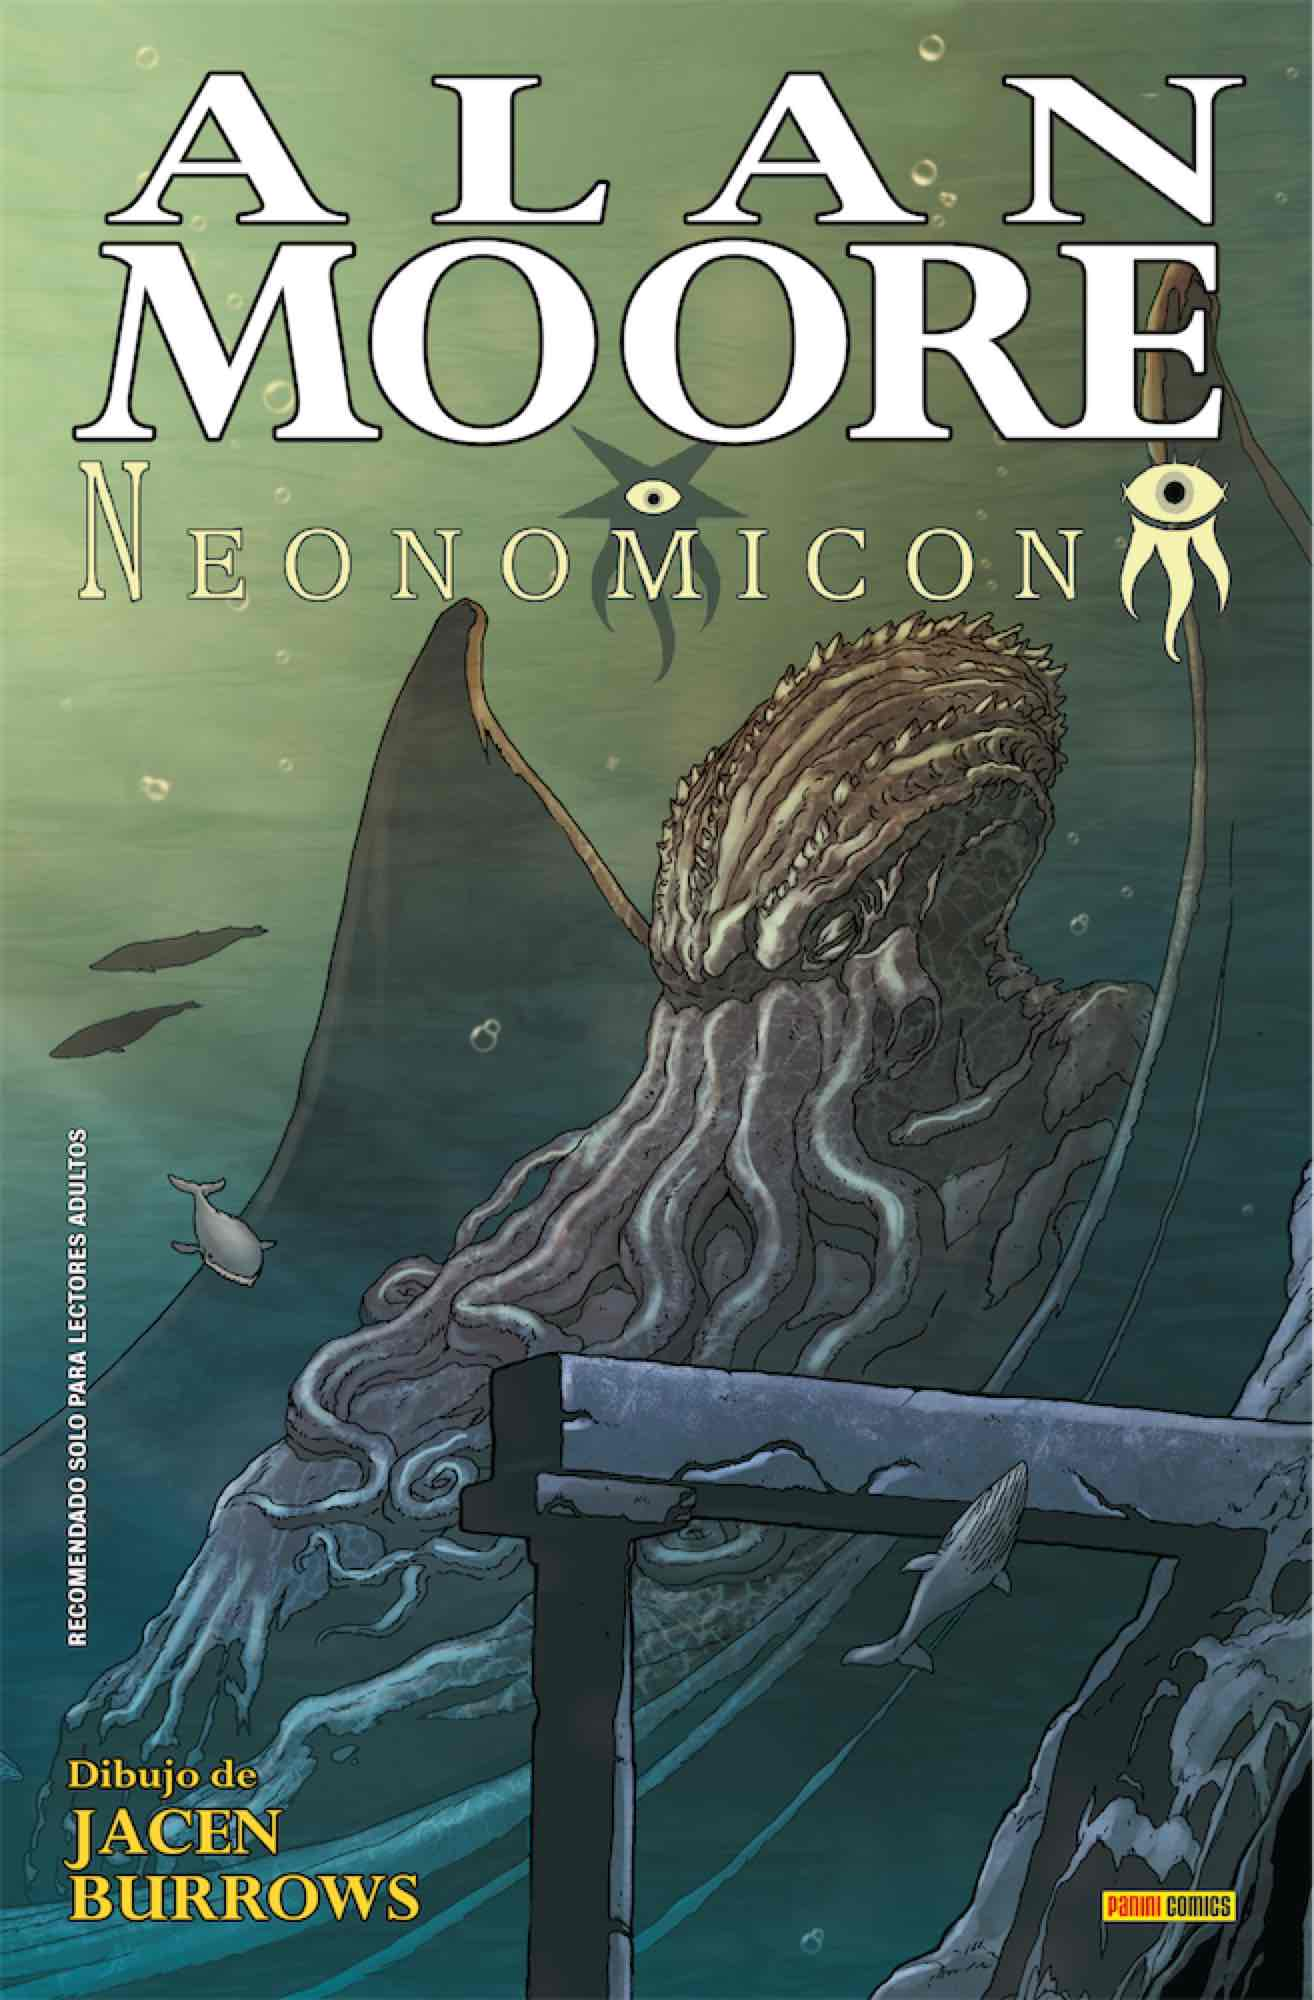 NEONOMICON (ALAN MOORE)